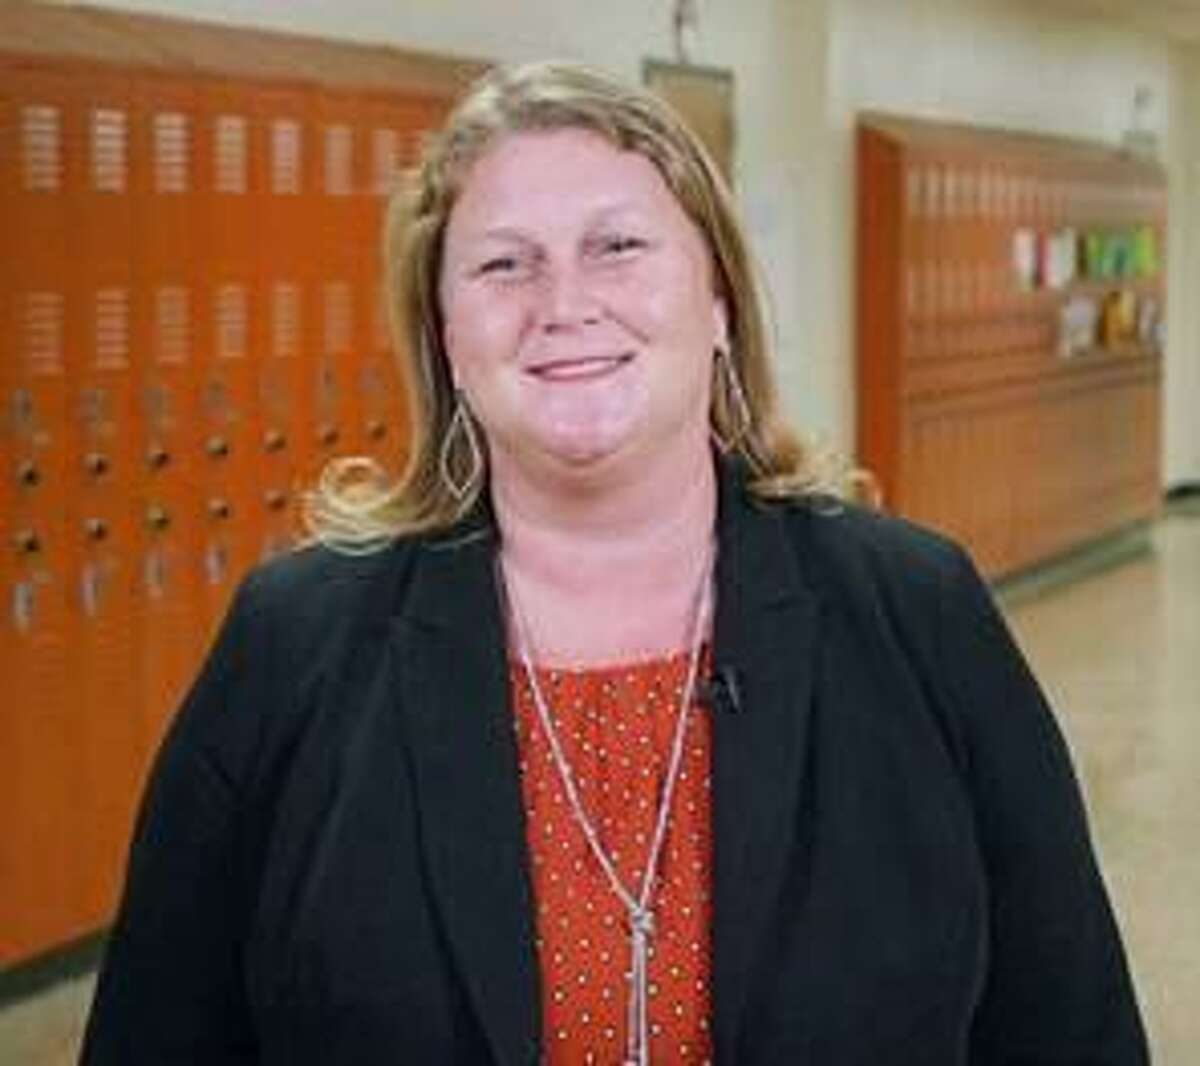 Gina Cobb has been named principal of Mayde Creek High School in Katy ISD.